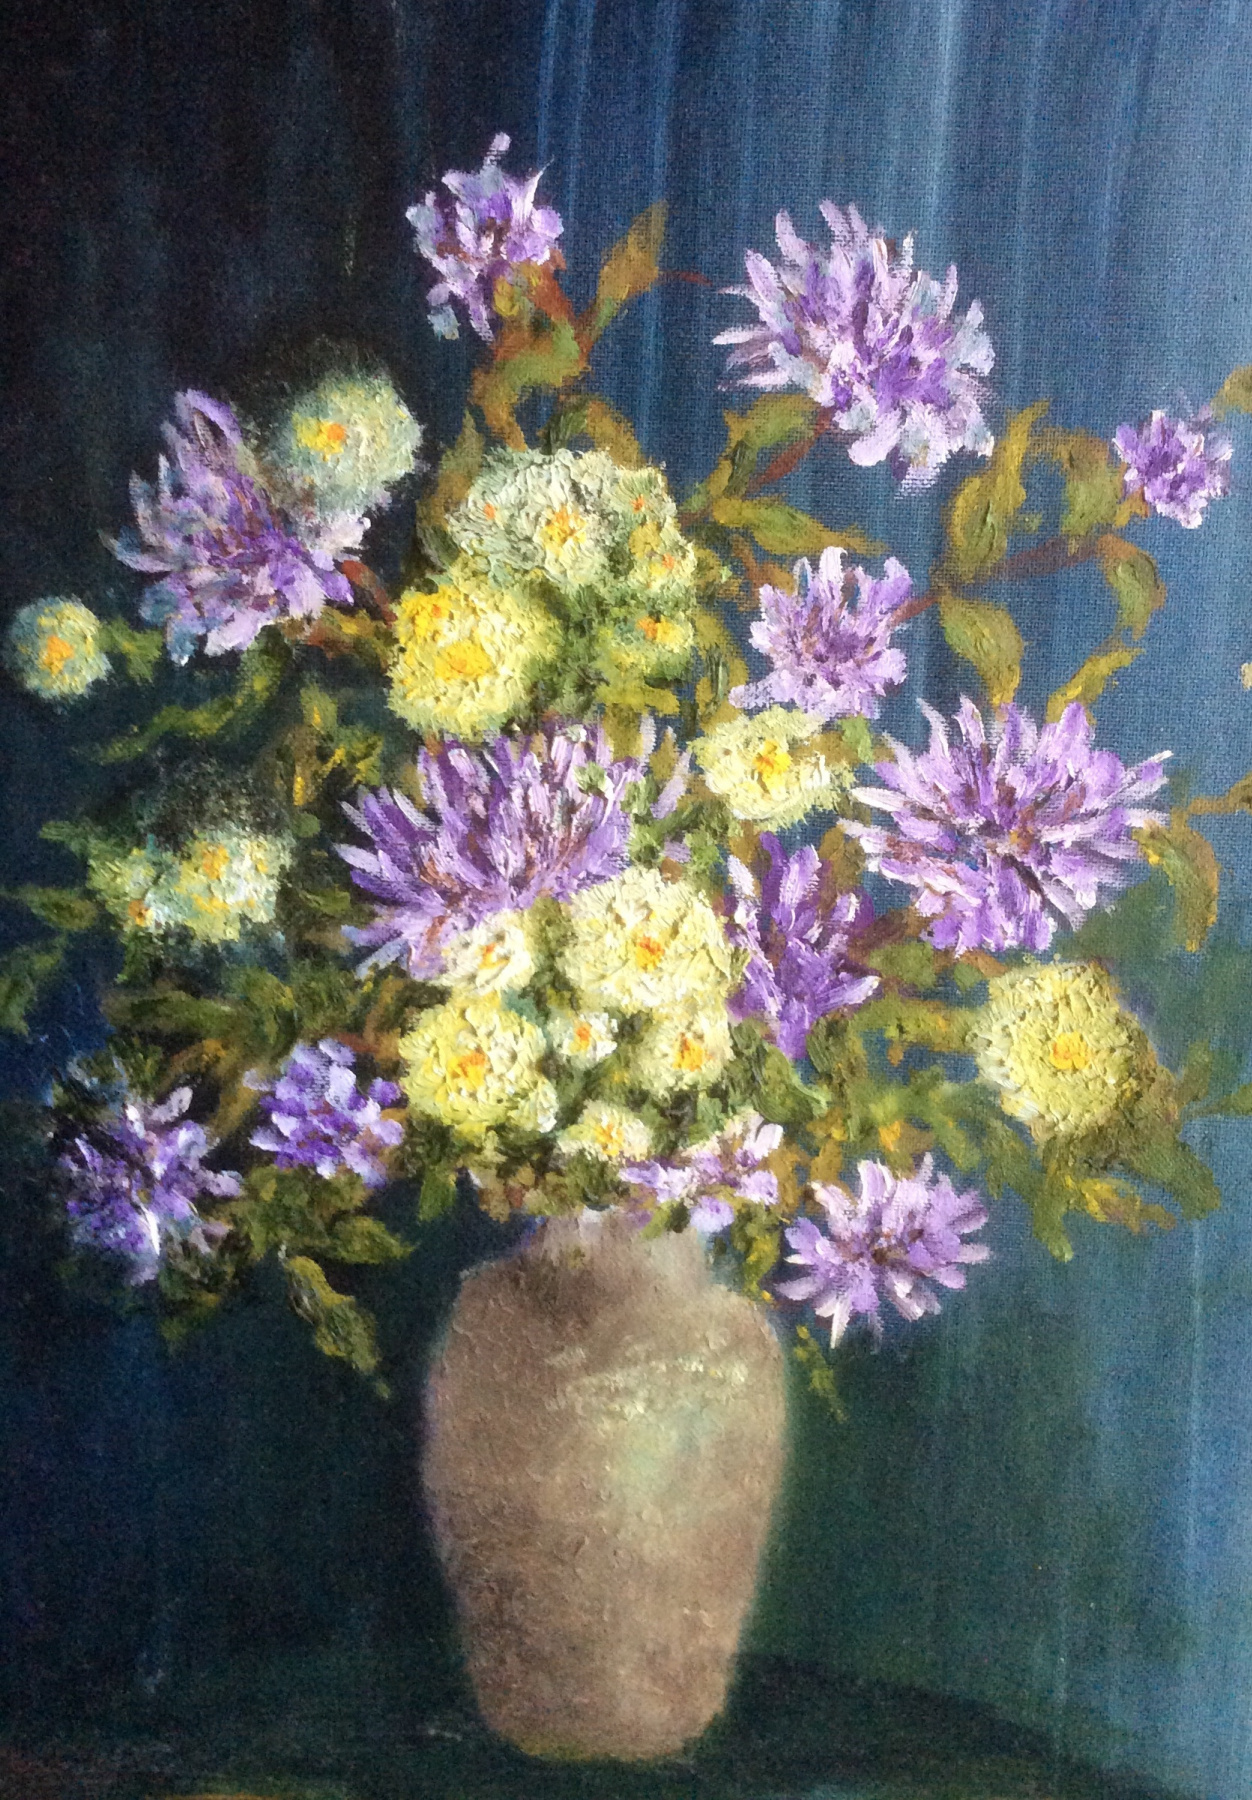 Rita Arkadievna Beckman. Chrysanthemums in a Vase